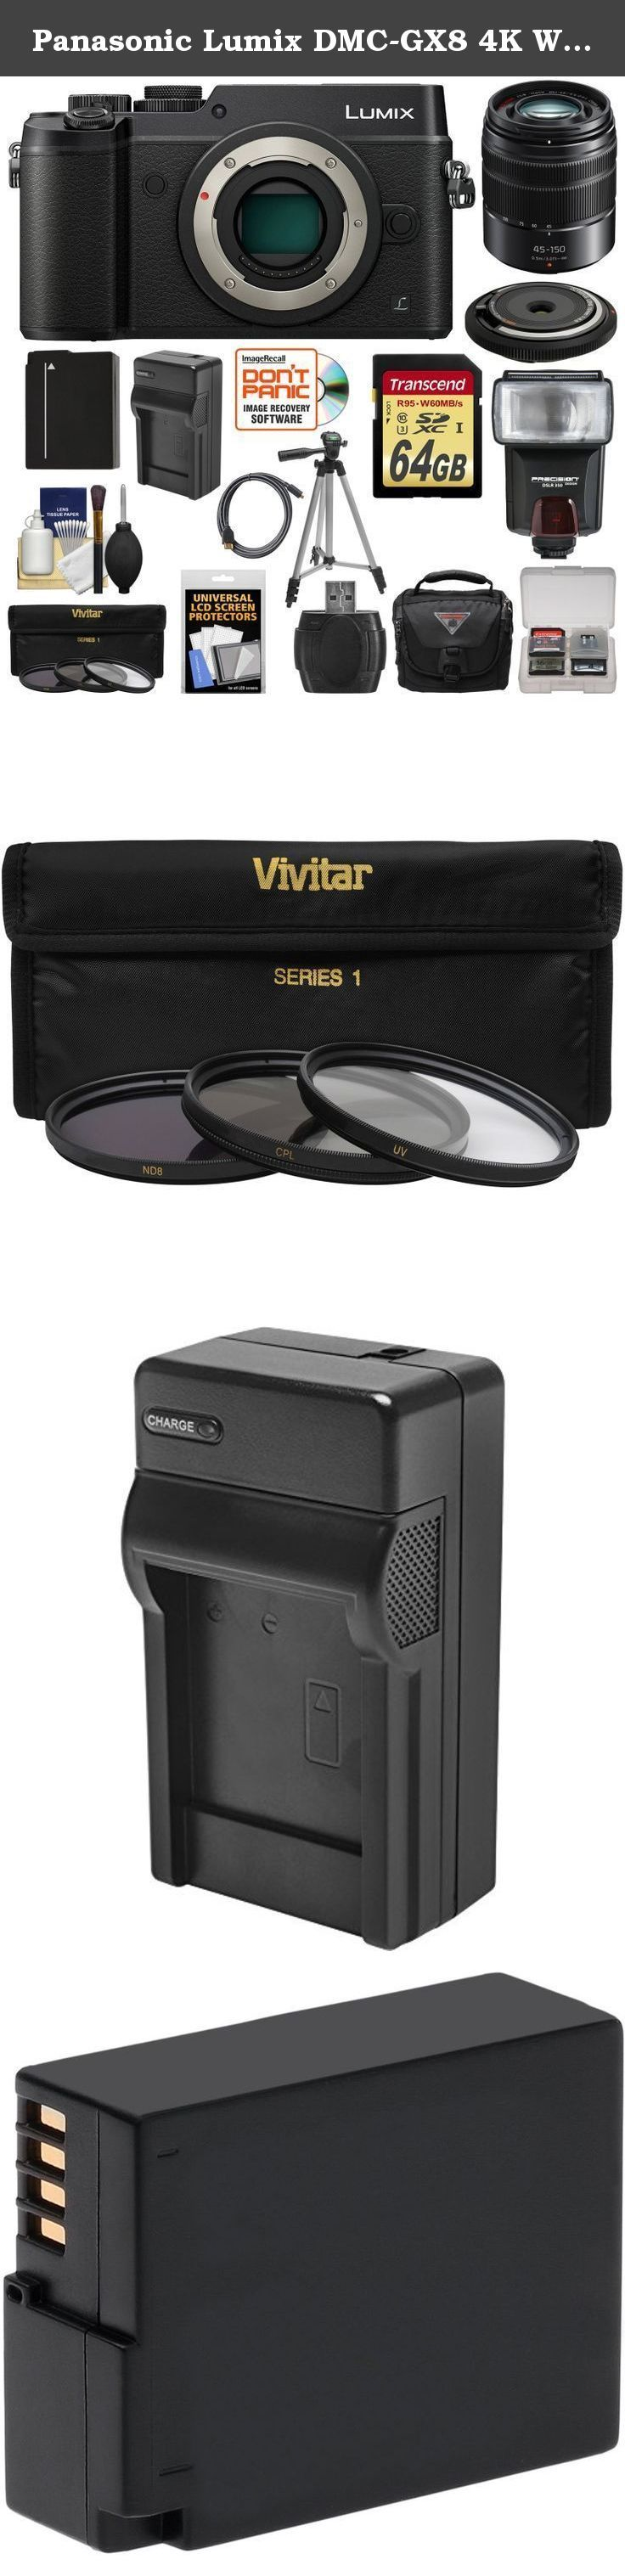 Panasonic Lumix DMC-GX8 4K Wi-Fi Digital Camera Body (Black) with 15mm & 45-150mm Lenses + 64GB Card + Battery + Charger + Case + Flash + Tripod + Kit. Kit includes: ♦ 1) Panasonic Lumix DMC-GX8 4K Wi-Fi Digital Camera (Black) ♦ 2) Panasonic Lumix G Vario 45-150mm OIS Zoom Lens ♦ 3) Olympus 15mm f/8.0 BCL-1580 Body Cap Lens ♦ 4) Transcend 64GB SecureDigital SDXC UHS-3 Memory Card ♦ 5) Spare DMW-BLC12 Battery ♦ 6) Battery Charger ♦ 7) Vivitar 3-Piece HD Filter Set (52mm UV/CPL/ND8) ♦ 8) PD...